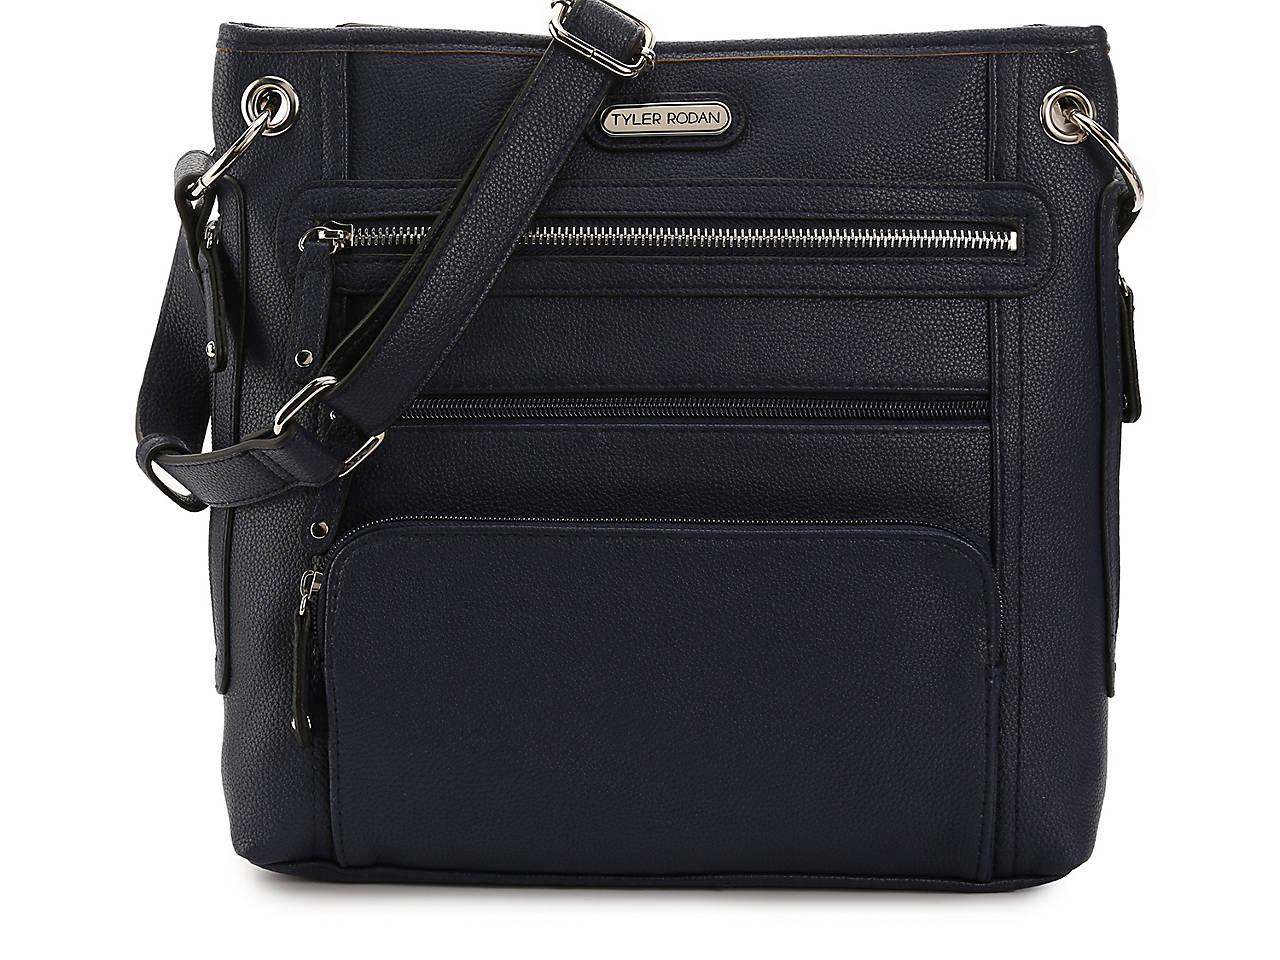 Tyler Rodan Brea Crossbody Bag Womens Handbags Accessories Dsw